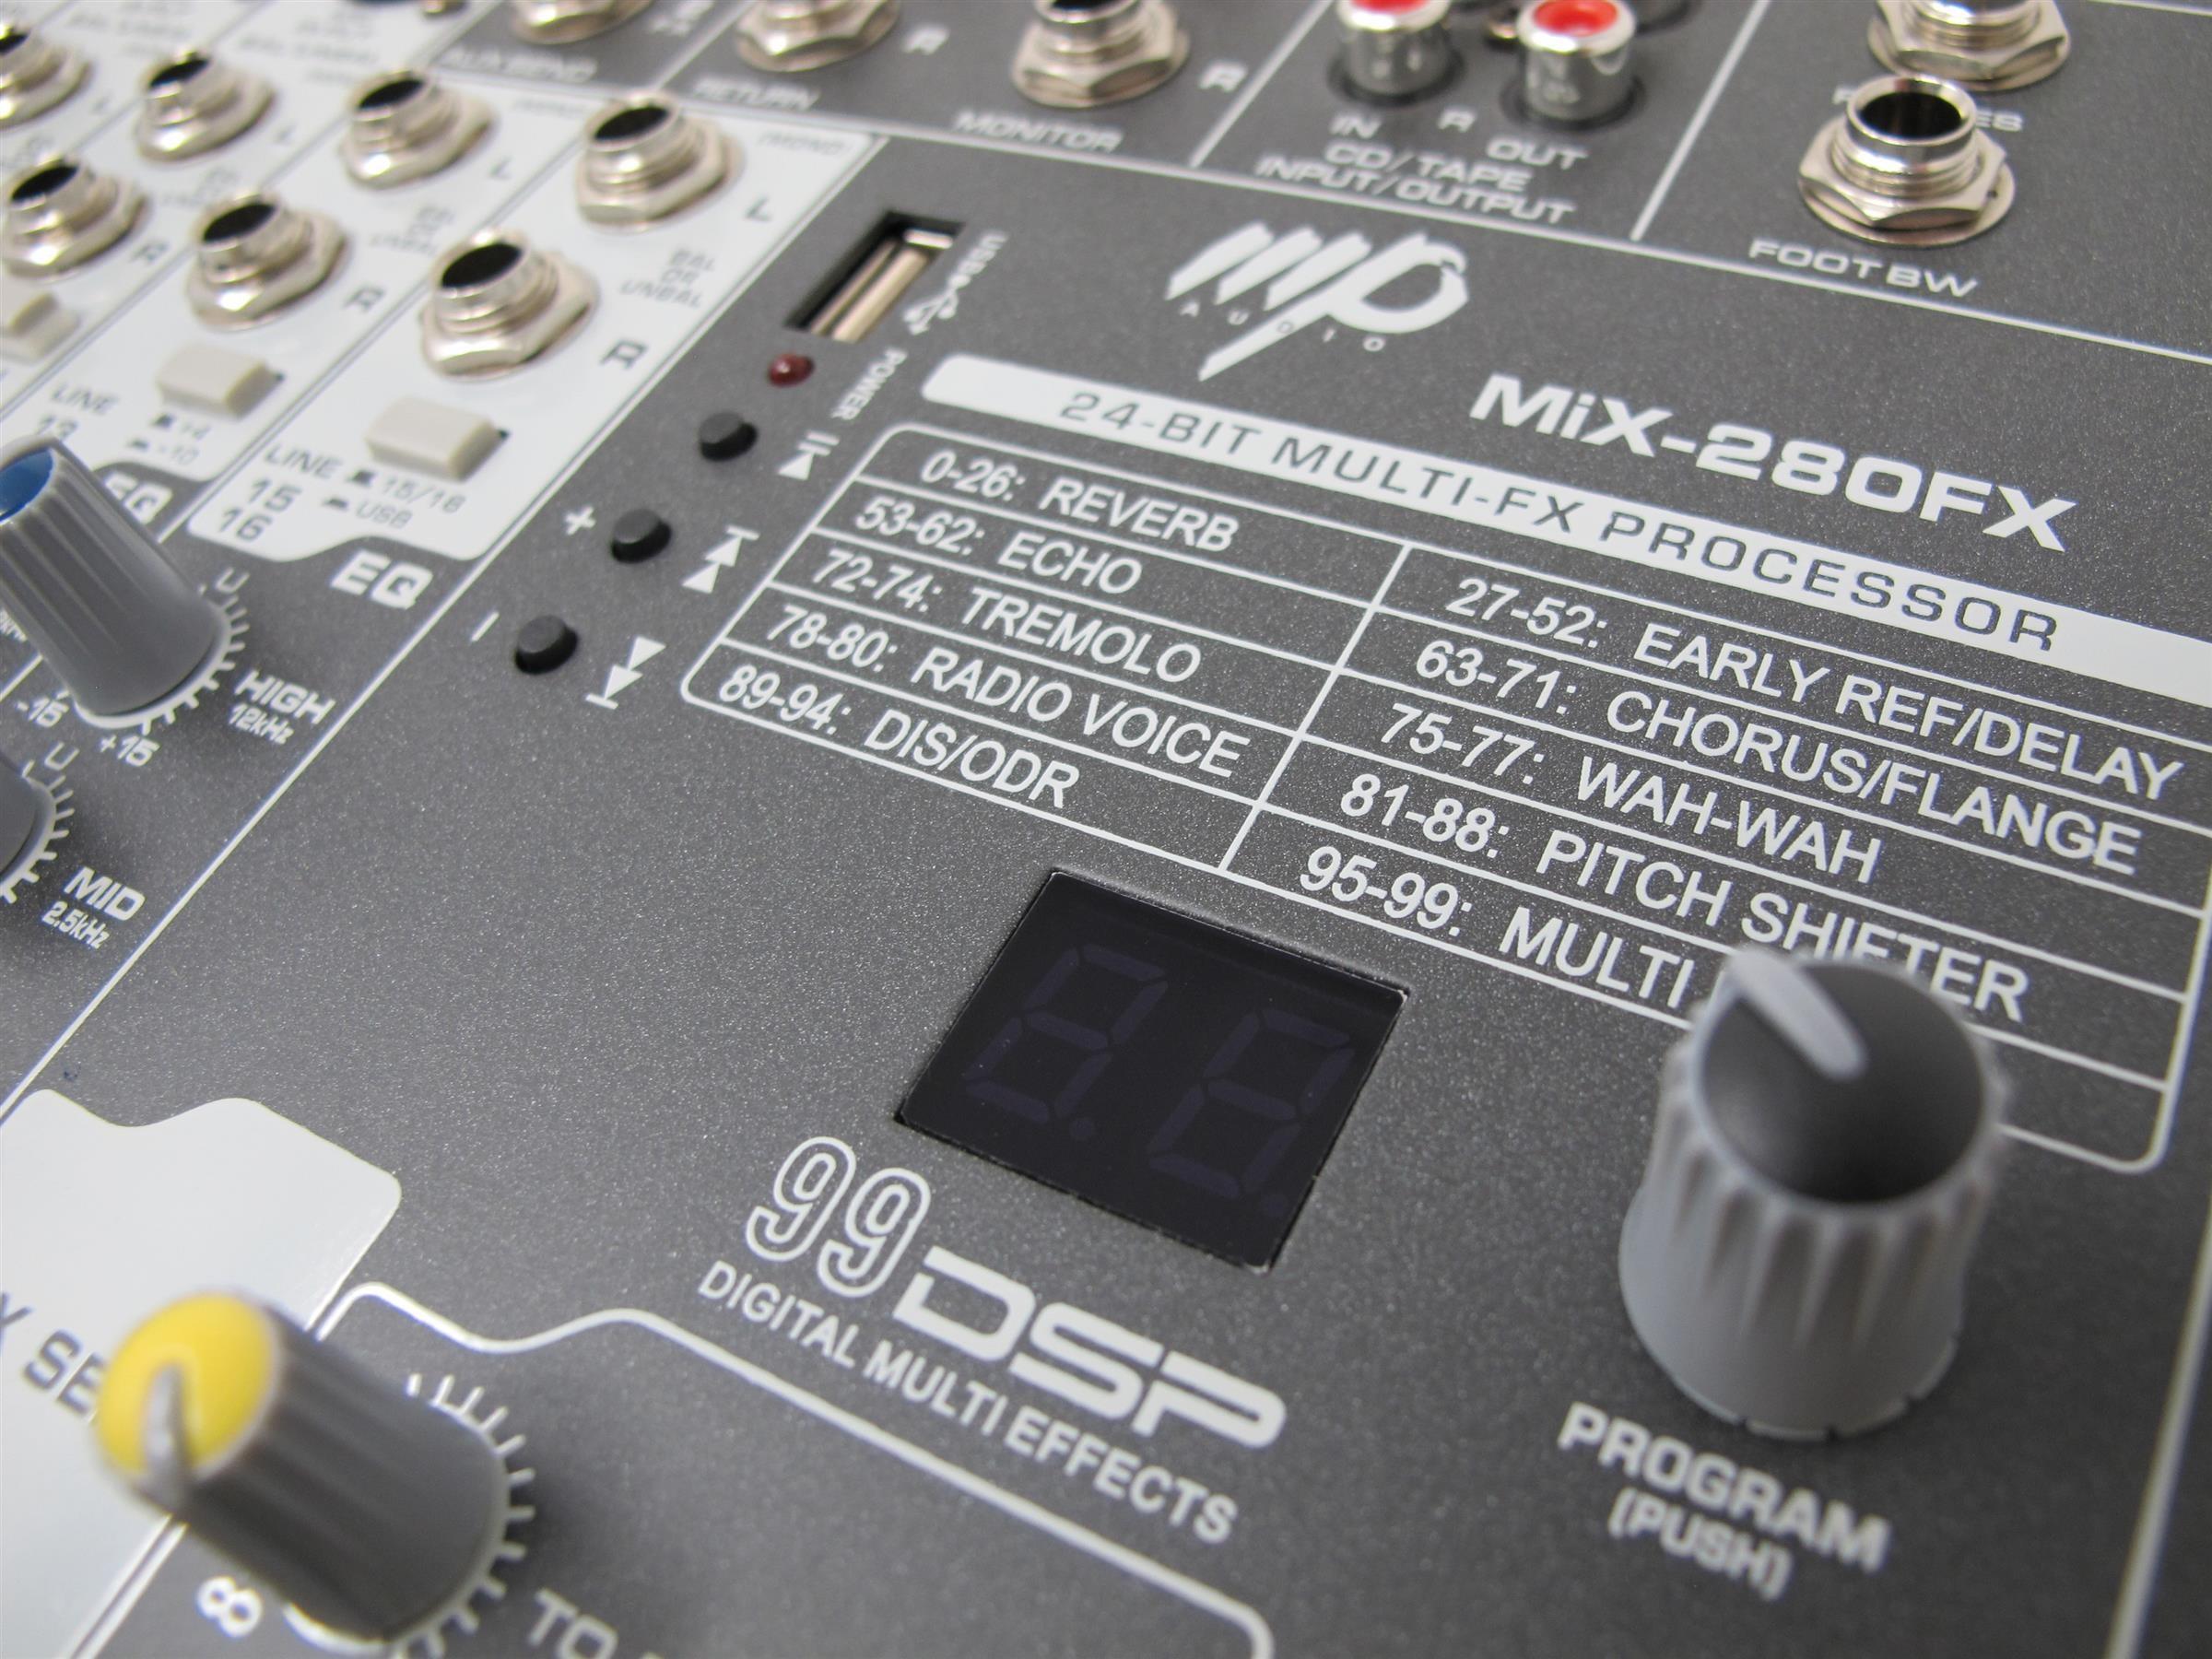 mp audio mixfx mixer dampiit